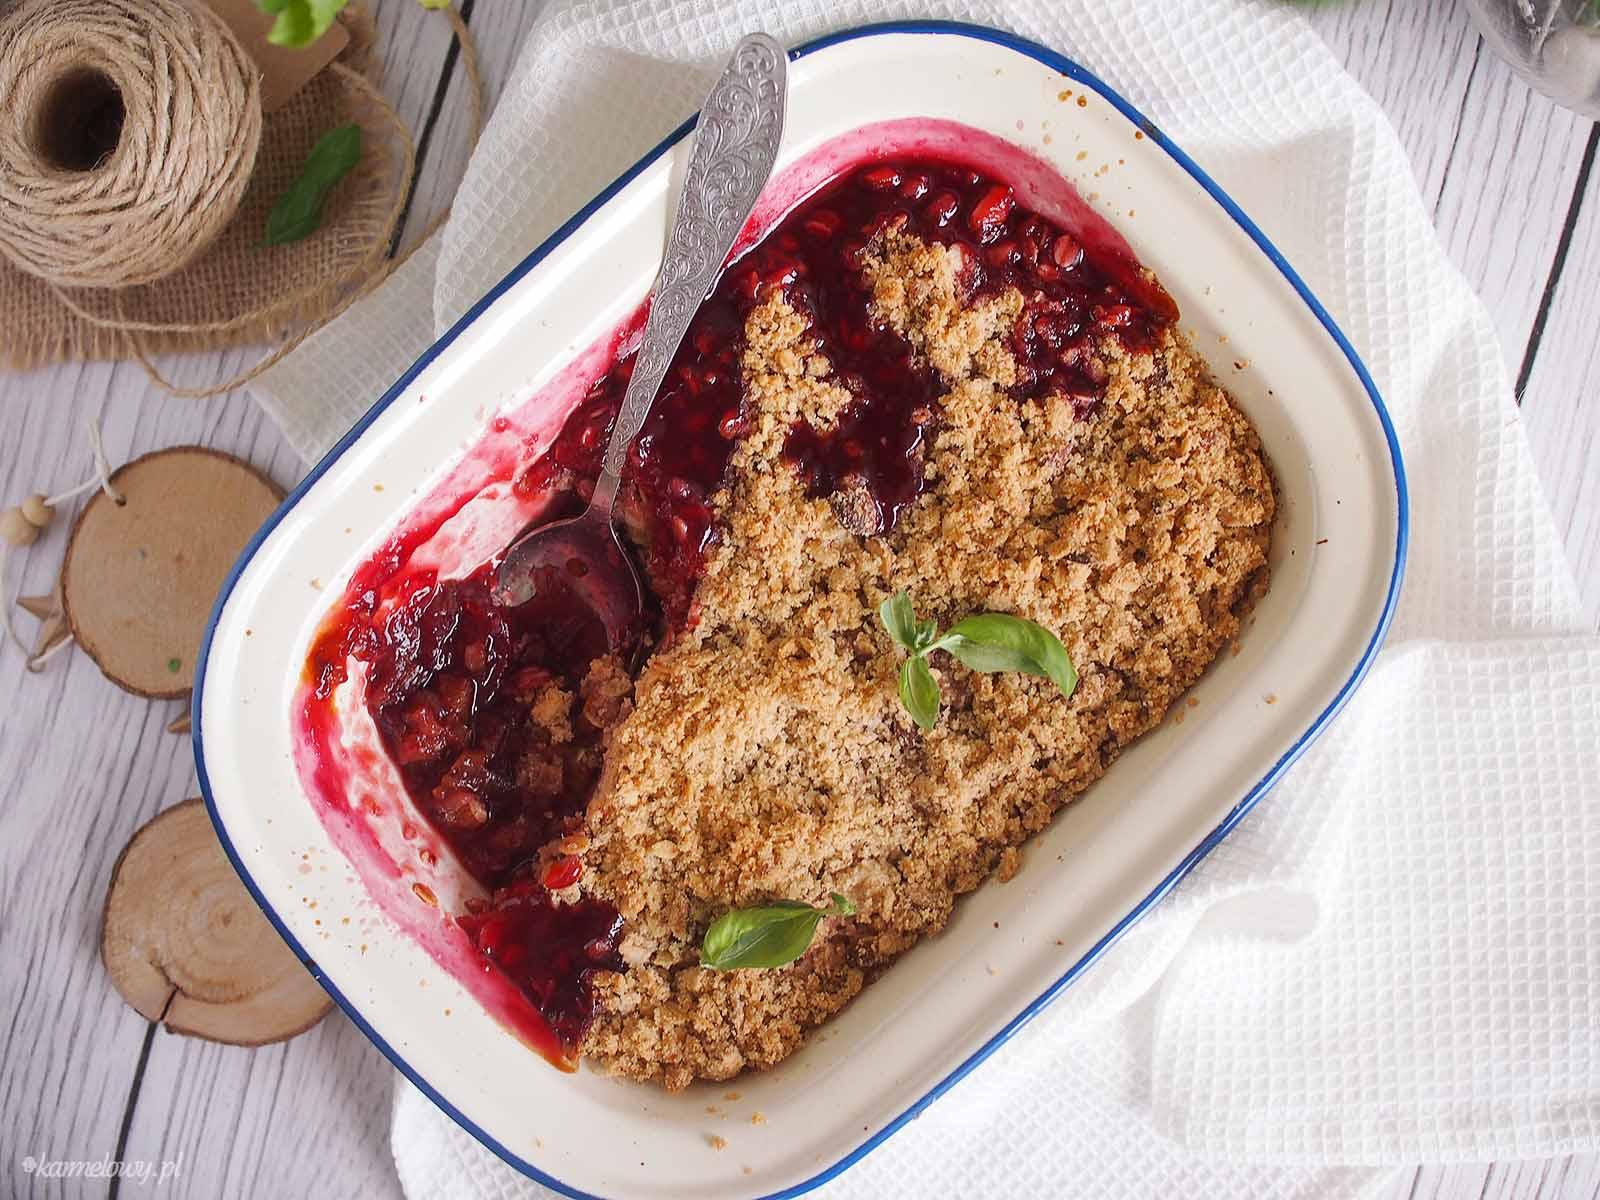 Rabarbar-i-czeresnie-pod-kruszonka-Rhubarb-cherry-crumble